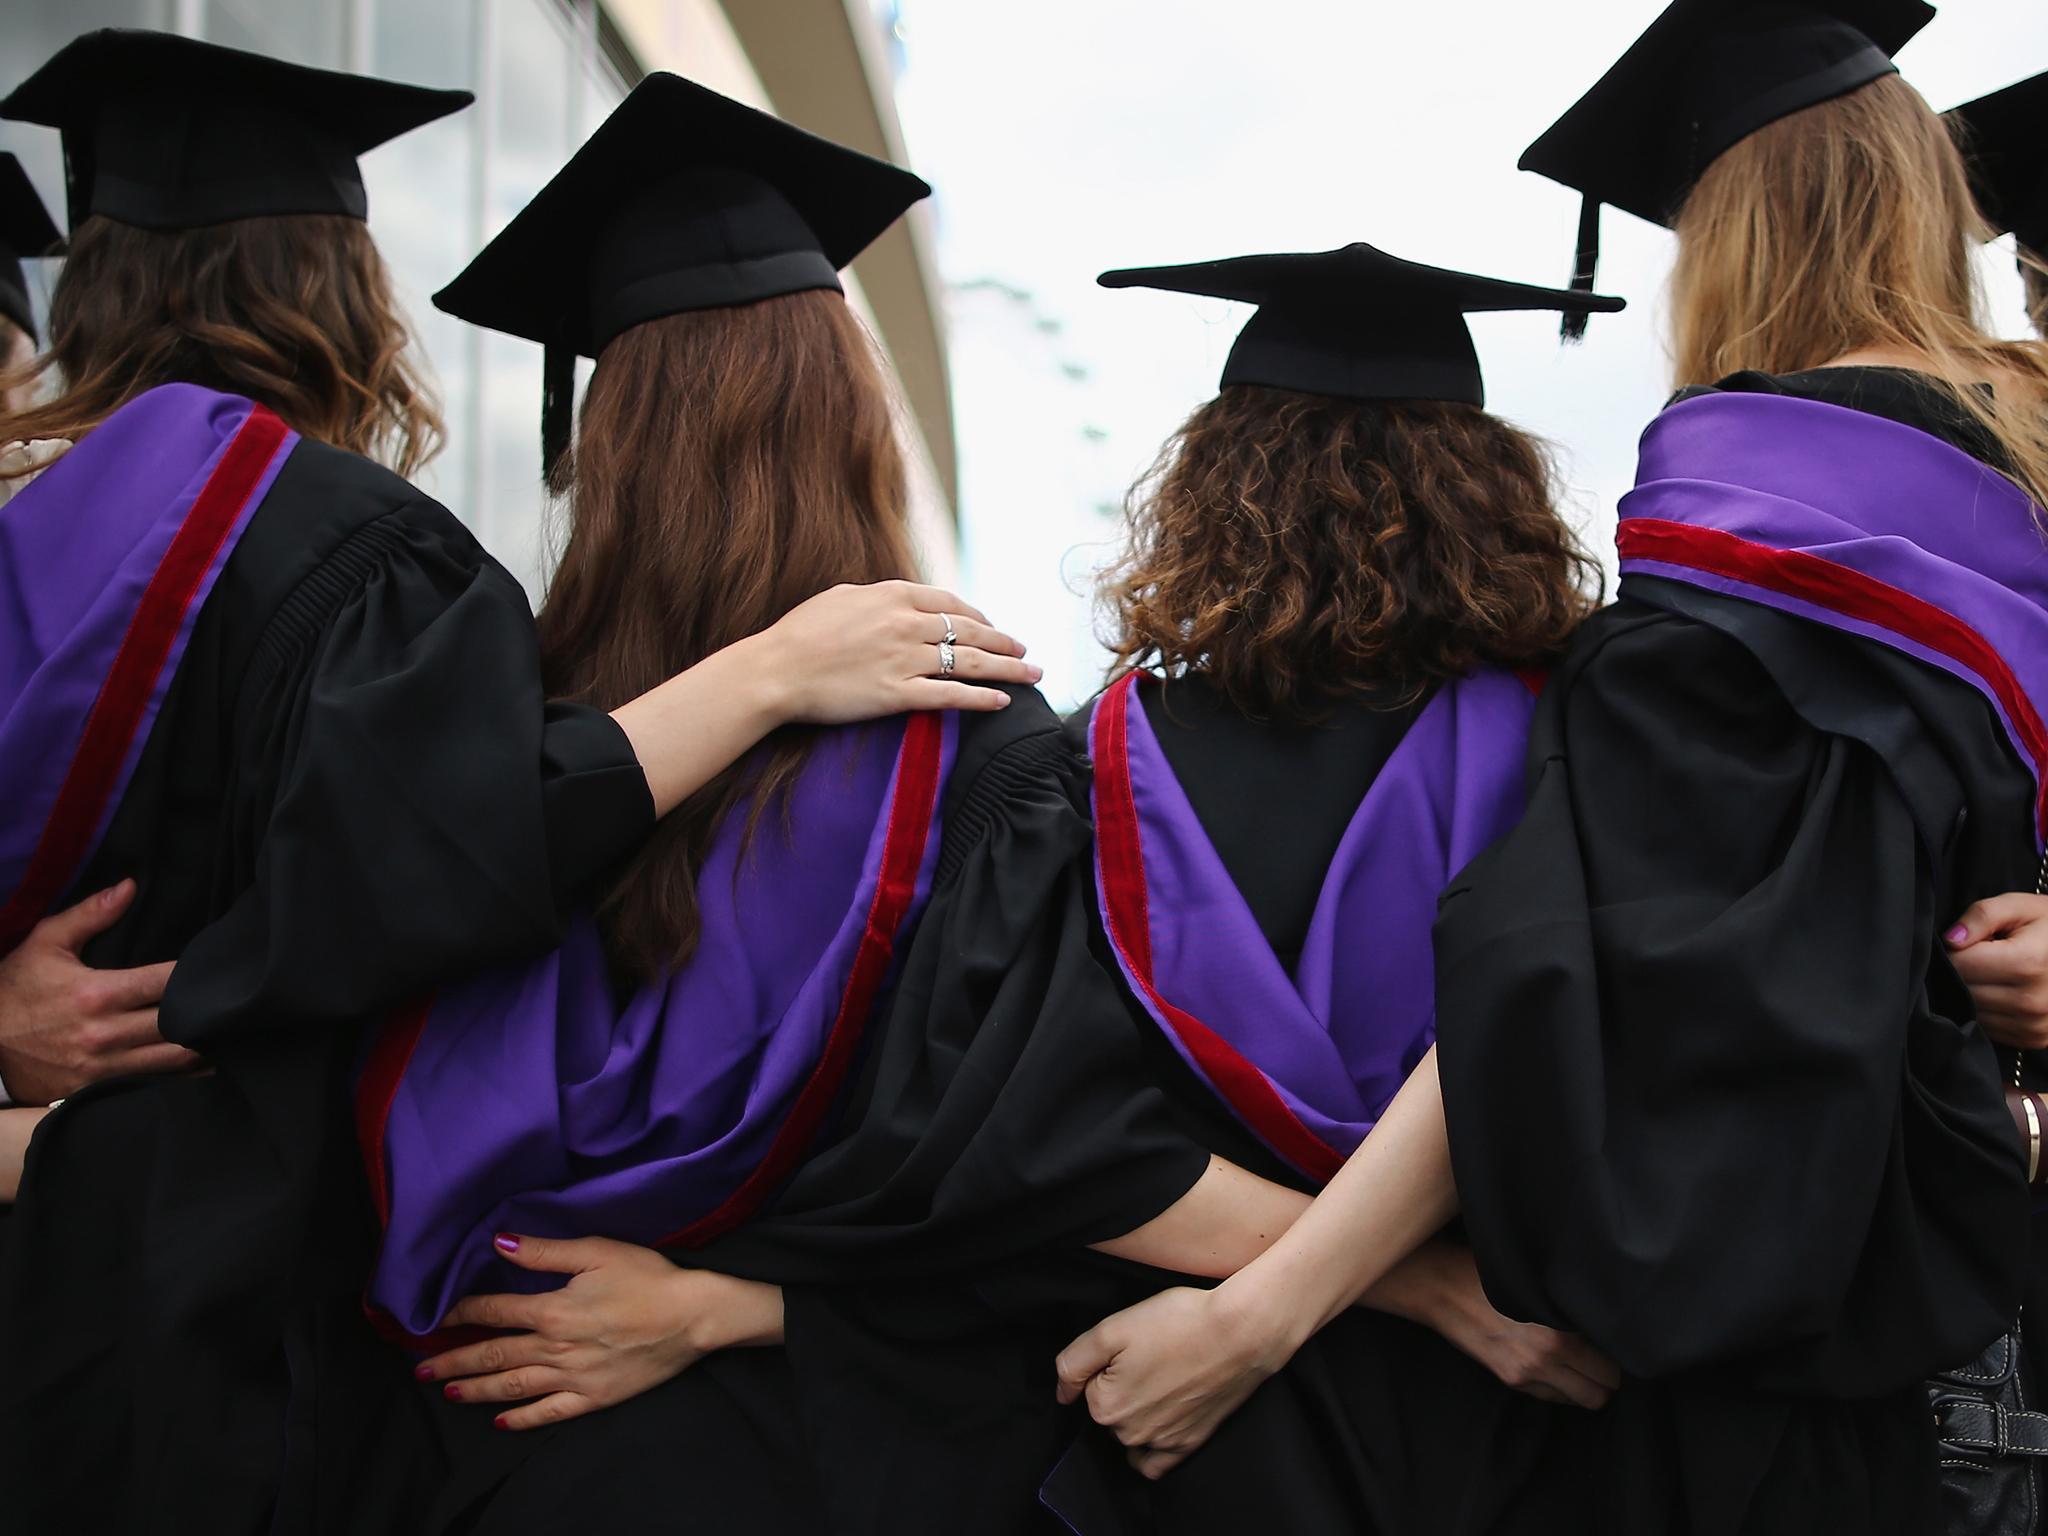 Degrees from non-elite universities worsen job prospects for privile…